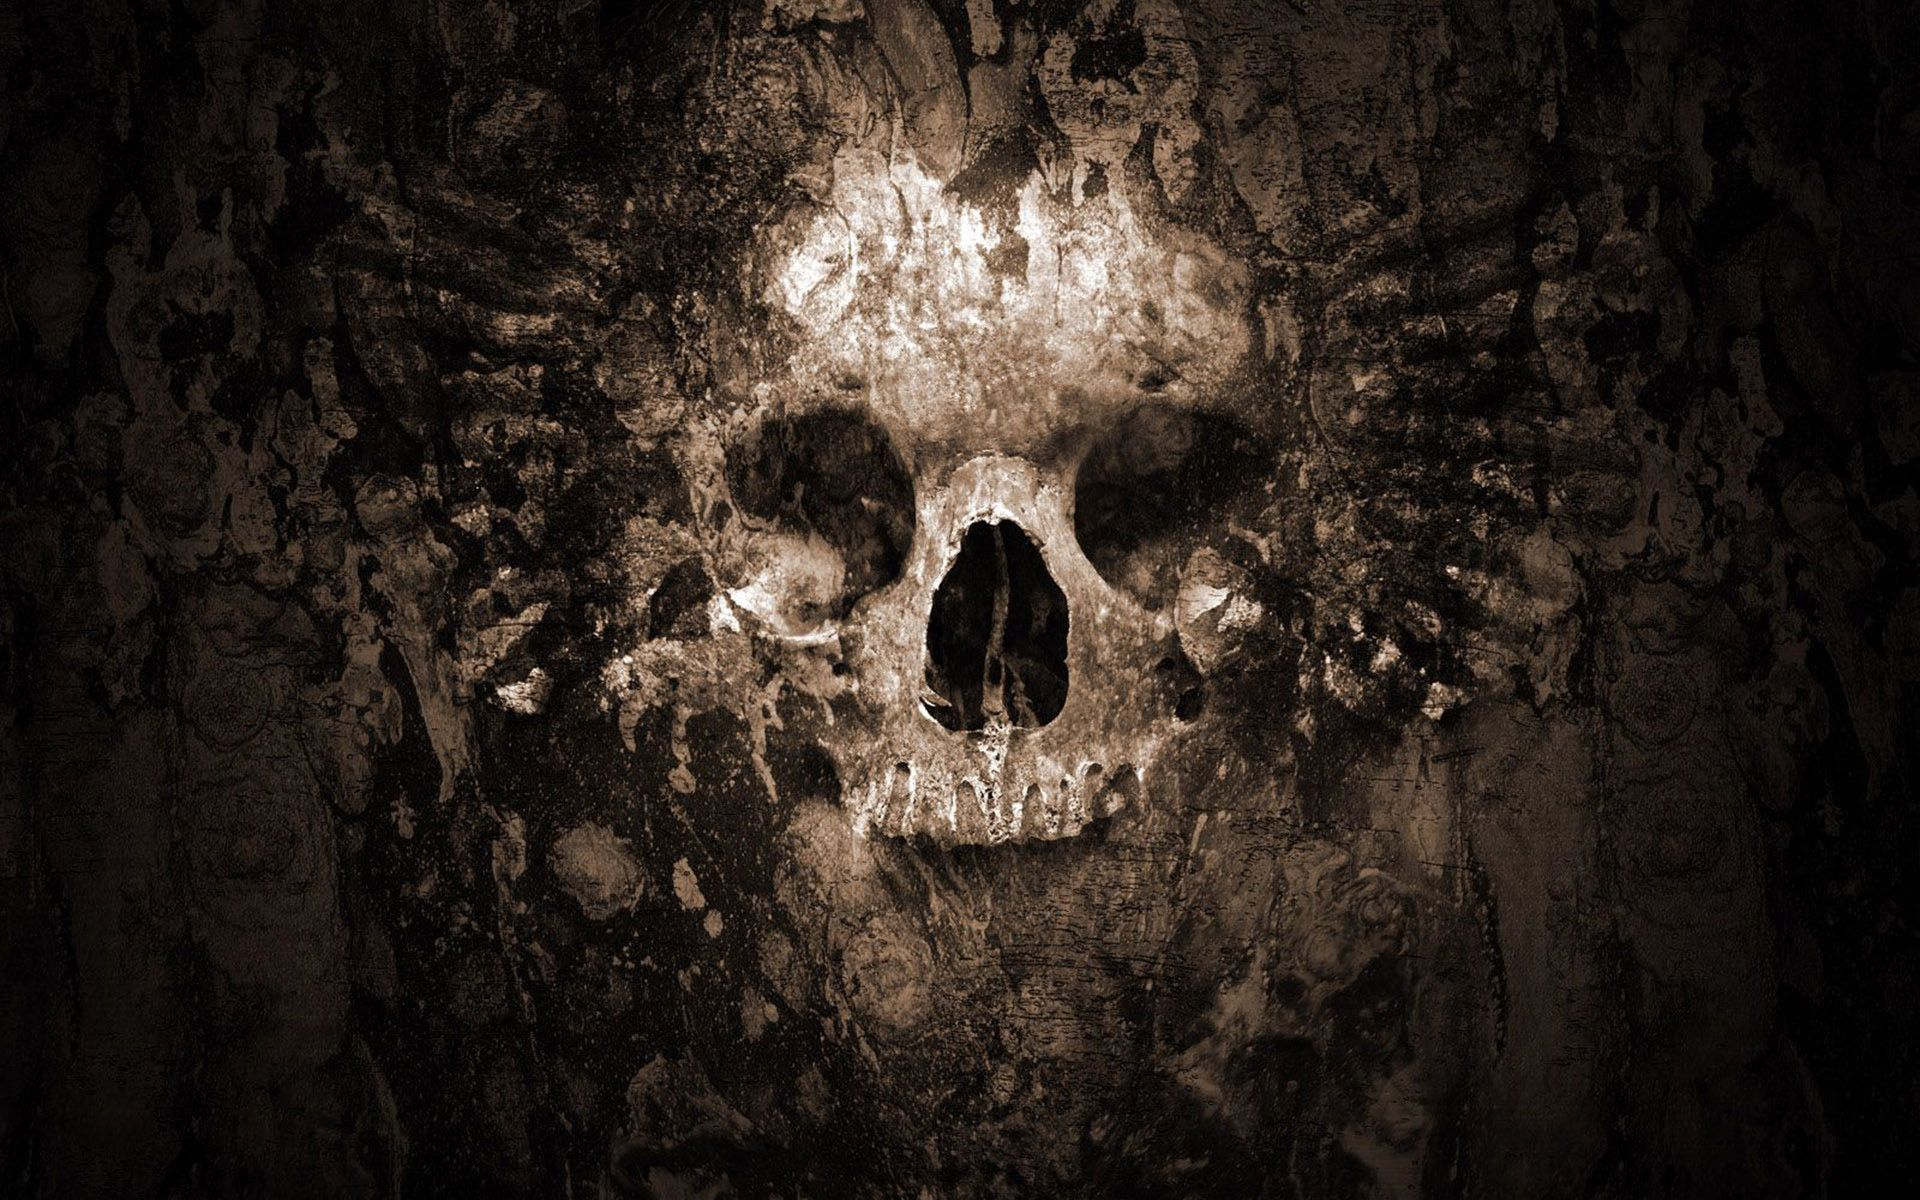 Hd Skull Wallpapers Iphone Se Skull Background 1920x1200 Wallpaper Teahub Io